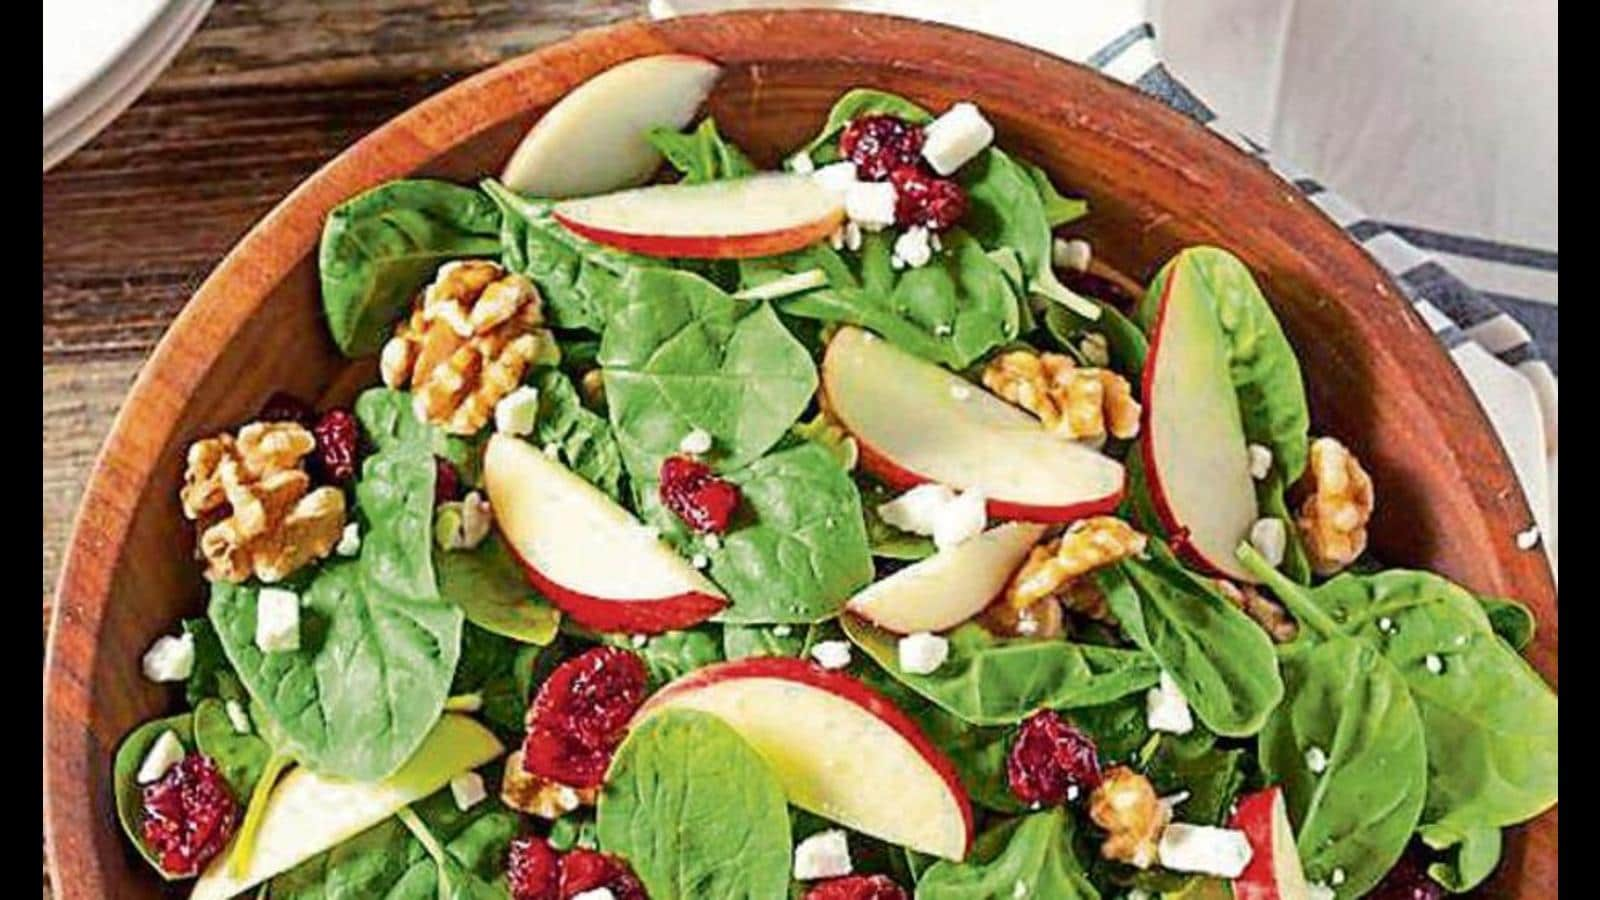 Salads: The summer staple